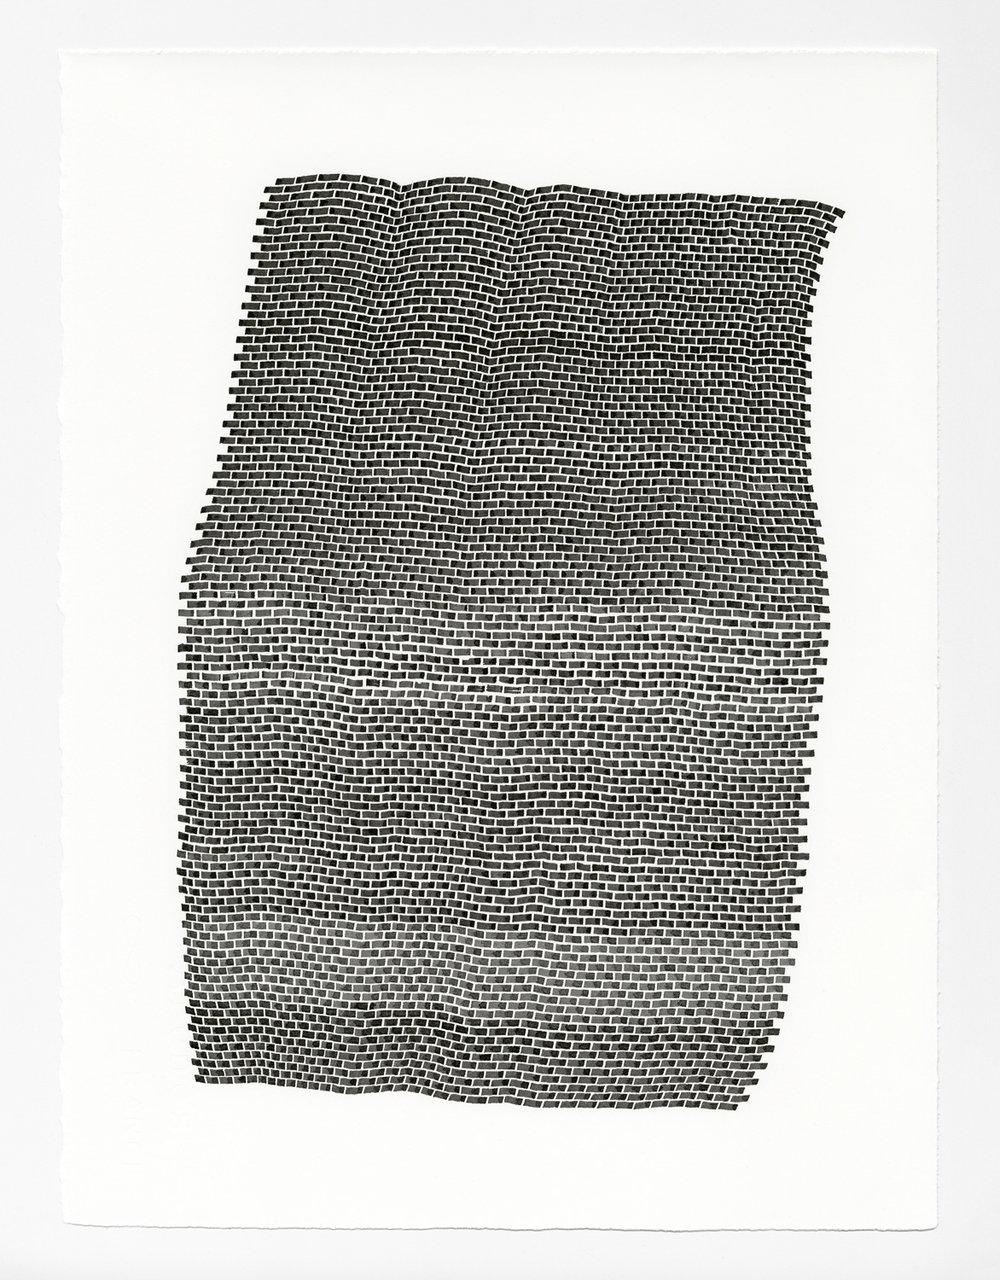 Bricks 1 ,  2017   sumi ink on 140 lb hot press watercolor paper 15 x 11 in (38.1 x 27.9 cm)